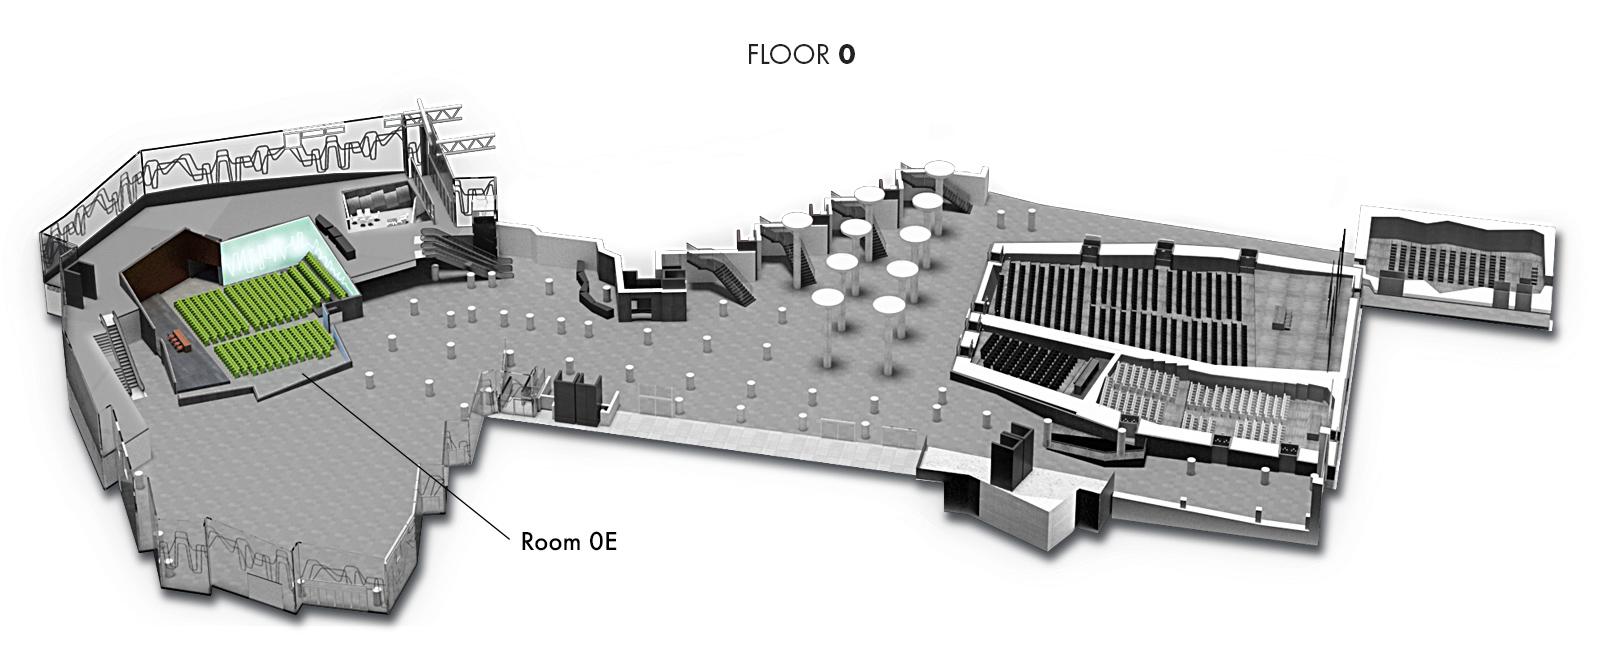 Room 0E, Floor 0 | Palacio Euskalduna Jauregia